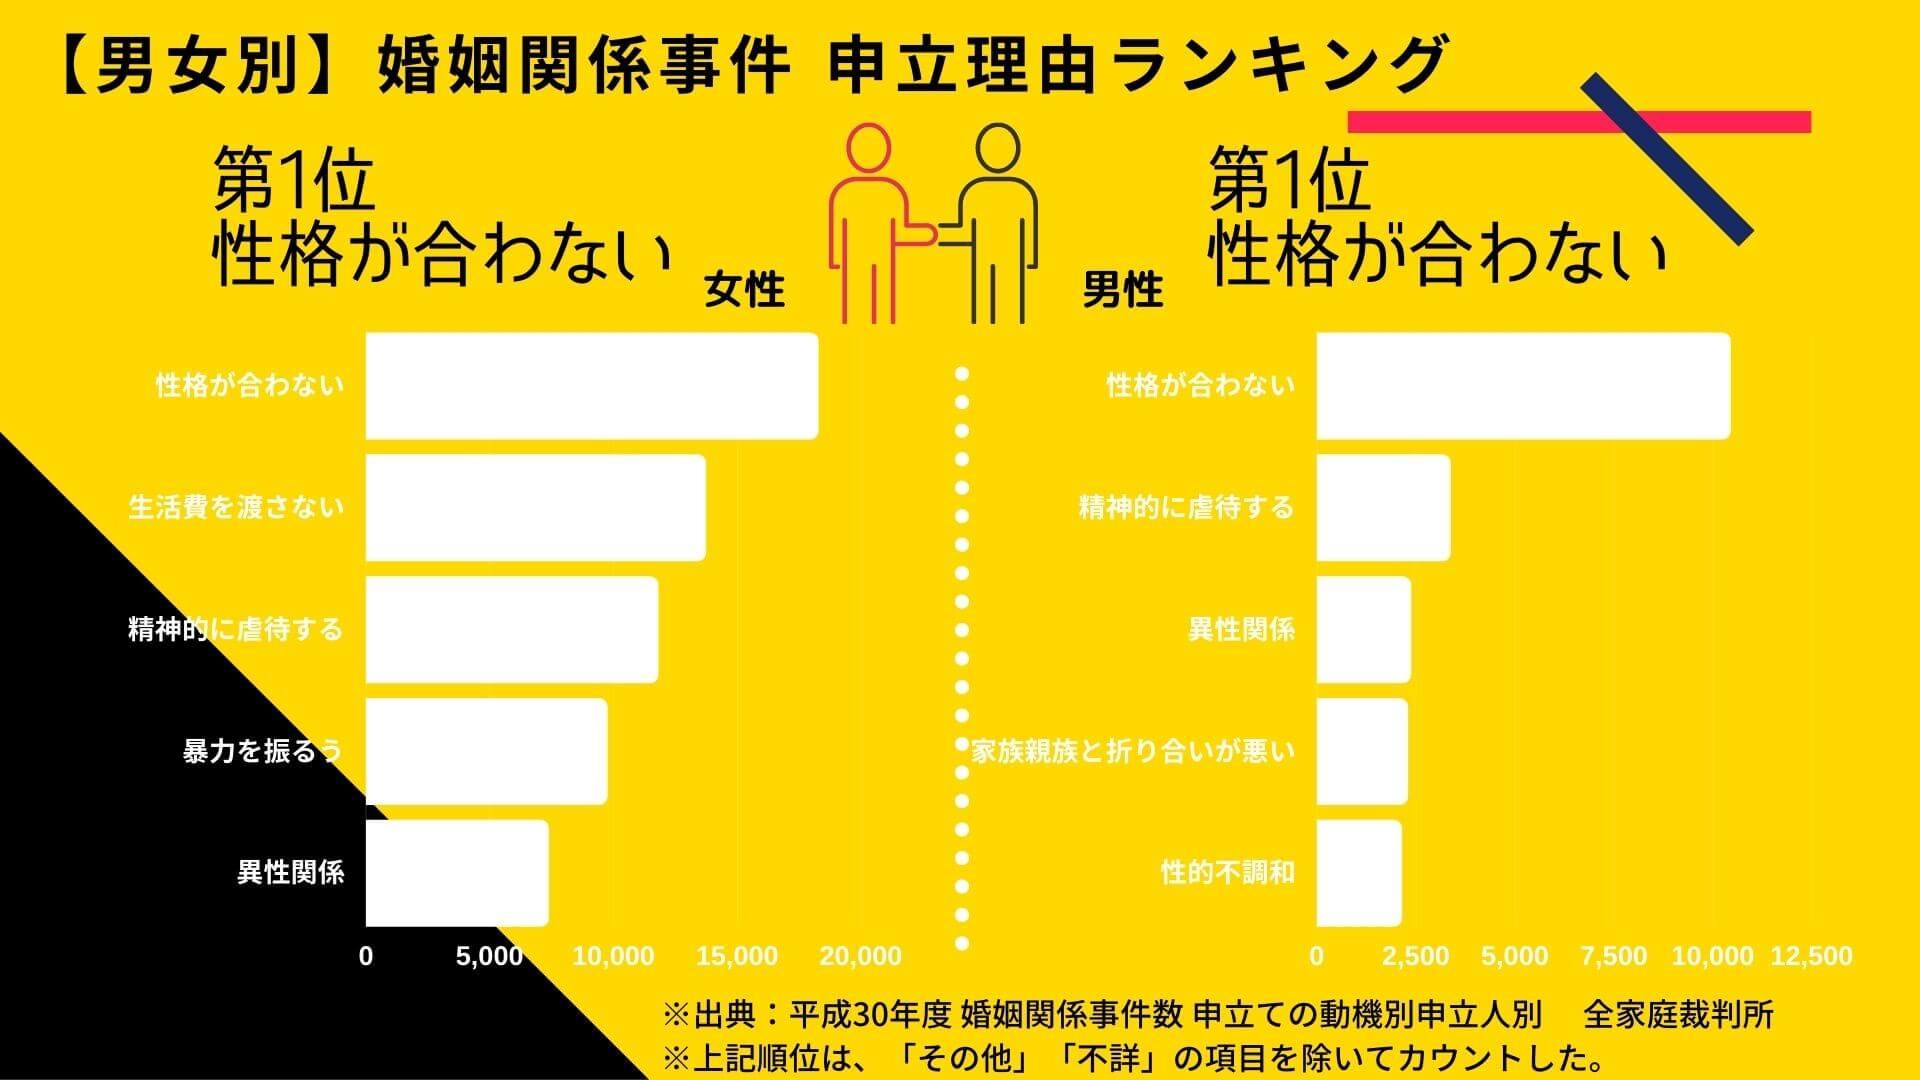 婚姻関係事件申立理由ランキング(平成30年度)